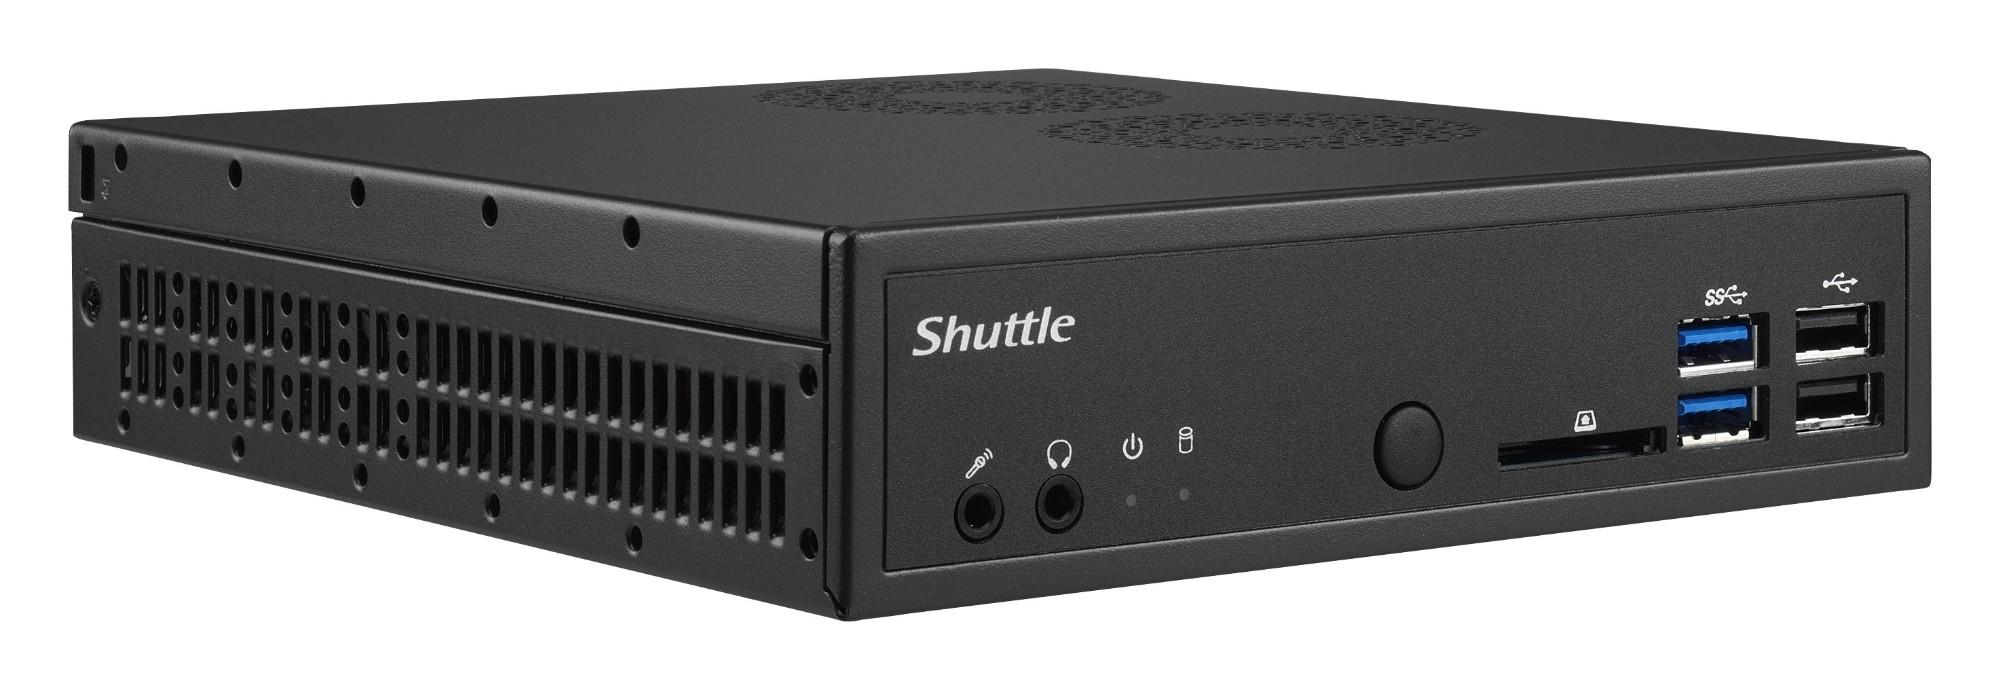 Shuttle DH110SE Intel H110 LGA 1151 (Socket H4) Nettop Black PC/workstation barebone